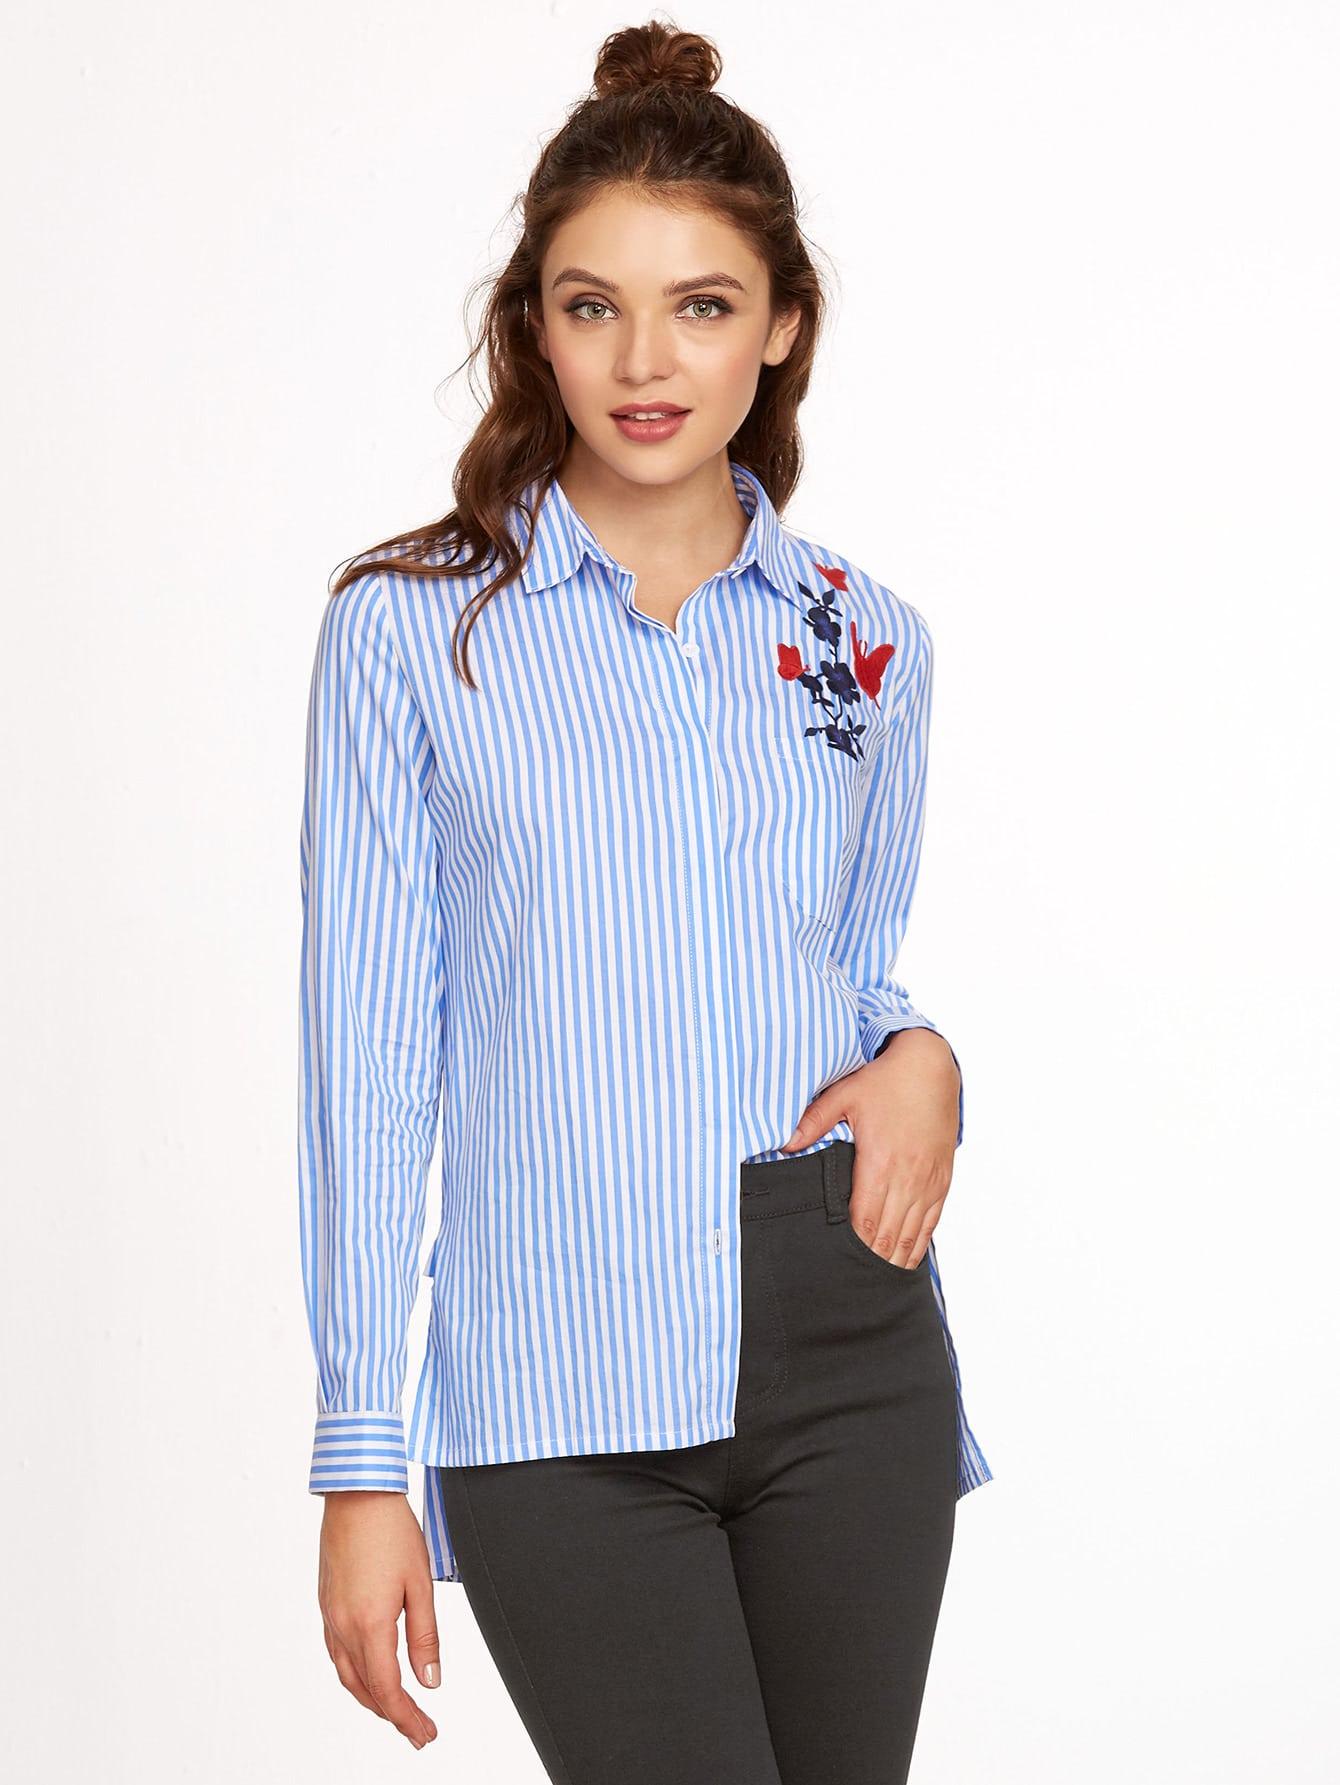 blouse161114702_2